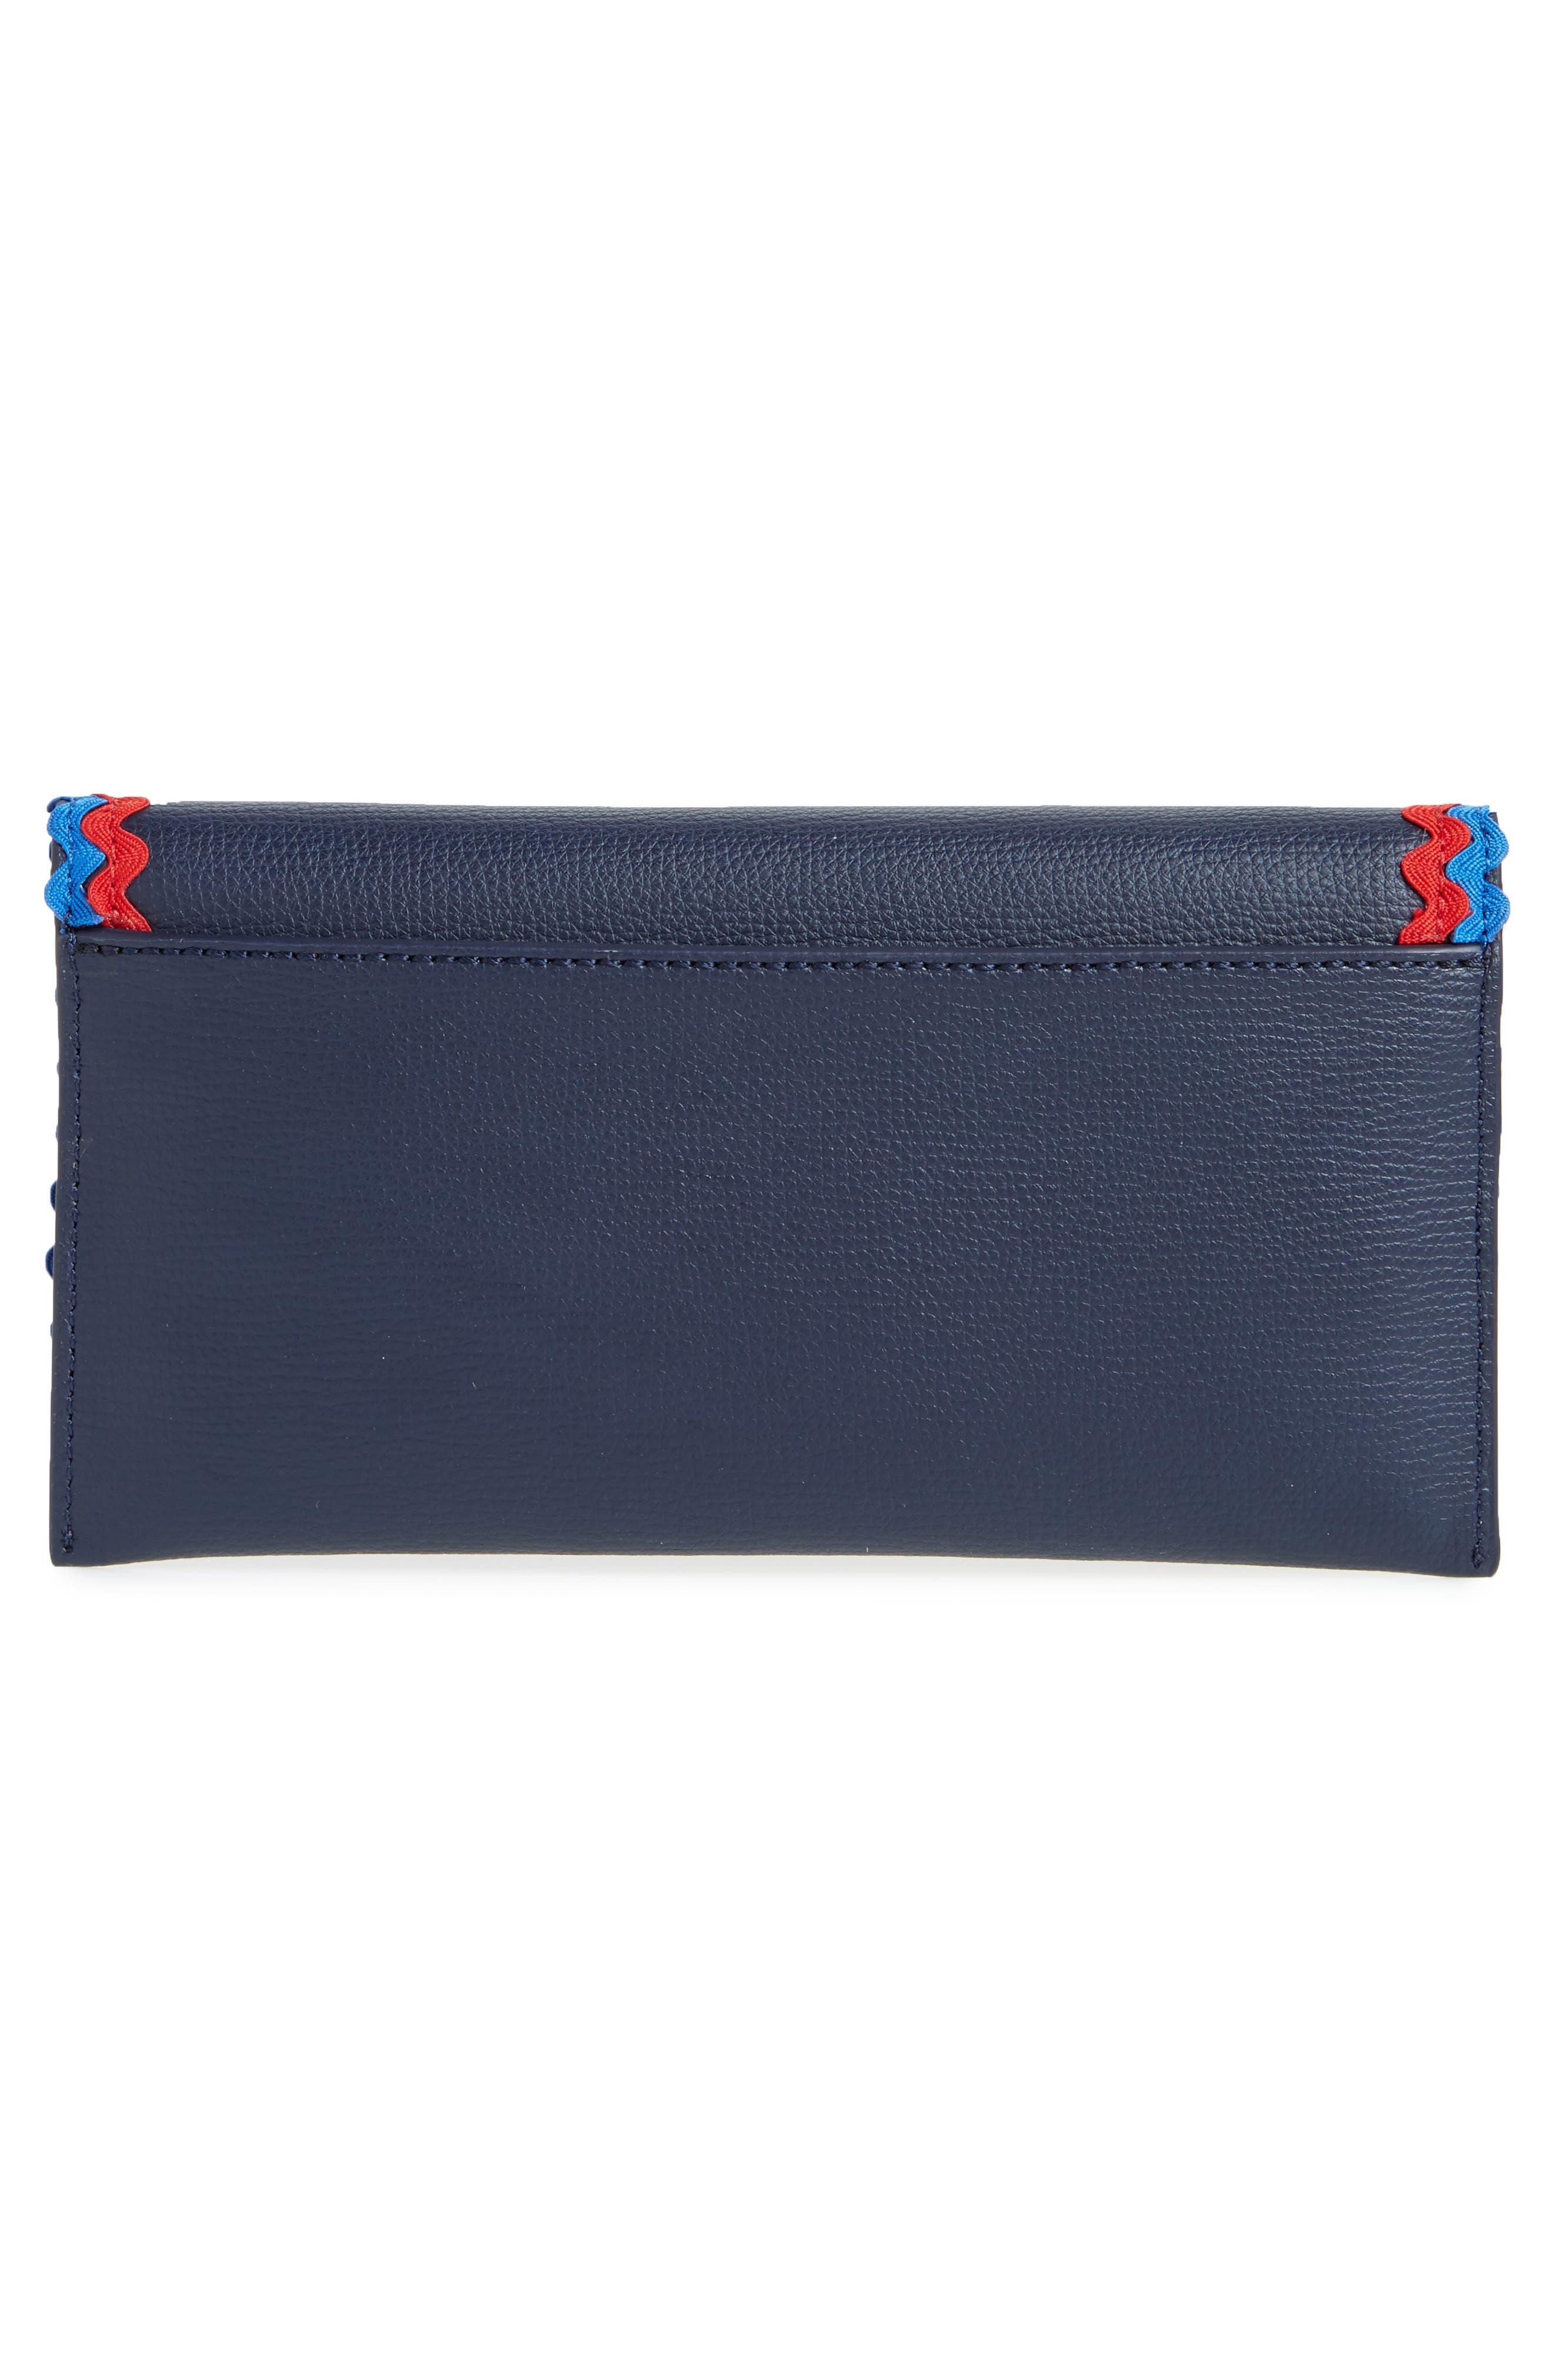 Alternate Image 4  - Loeffler Randall Eveything Embellished Leather Wallet